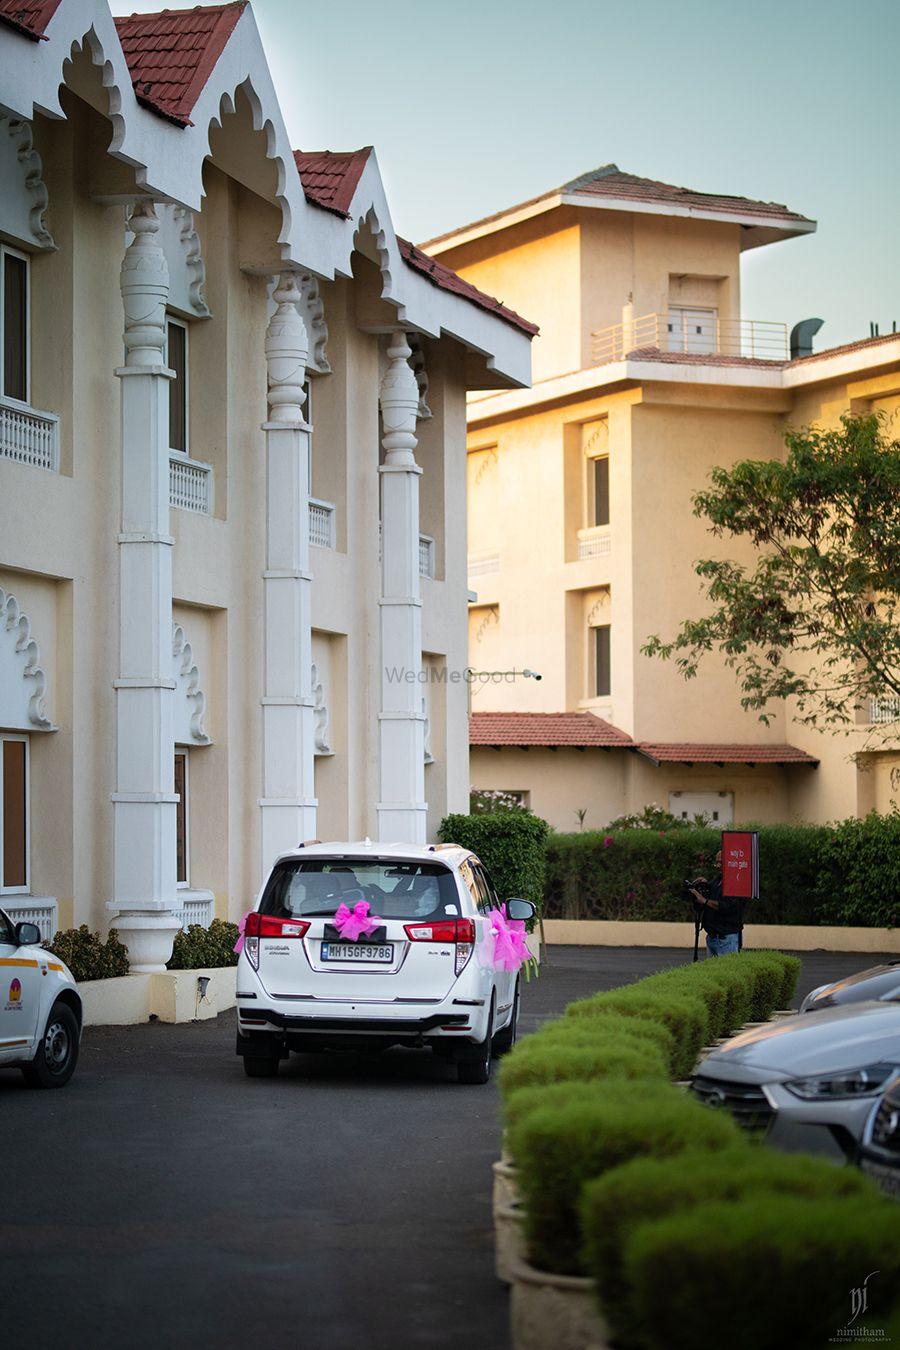 Photo From Destination wedding in Nashik  Aditi & Rohit.....Taj Gateway - By Nimitham Wedding Photography